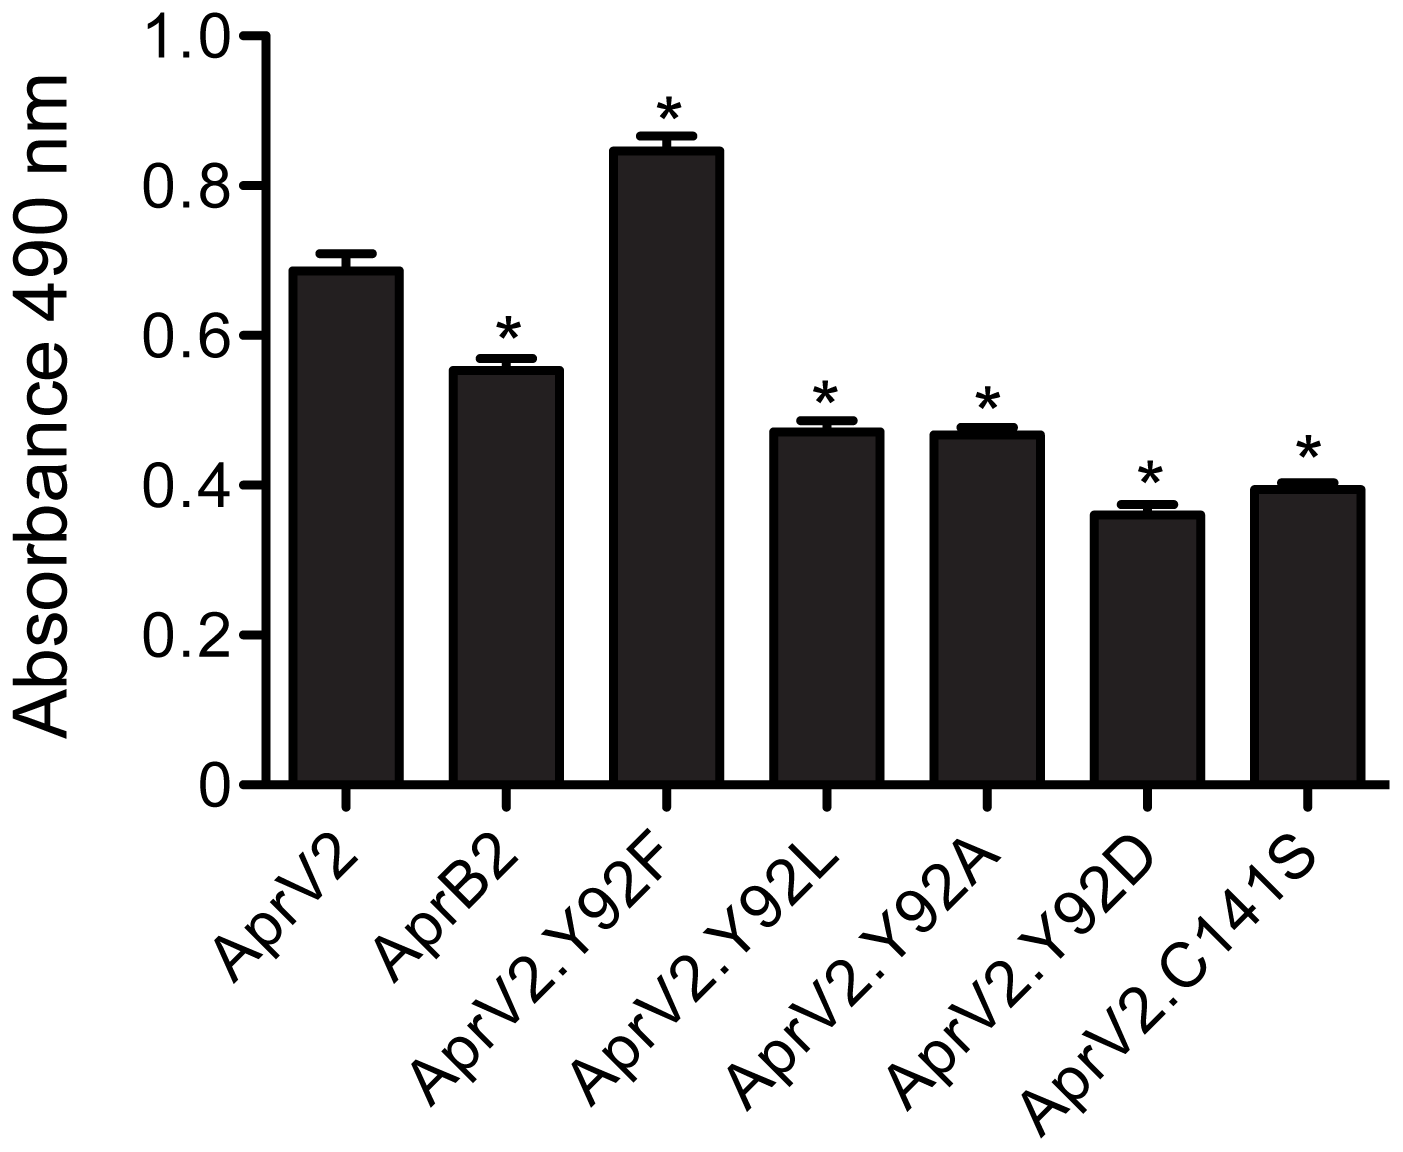 Elastase activity of AprV2, AprB2 and mutants.